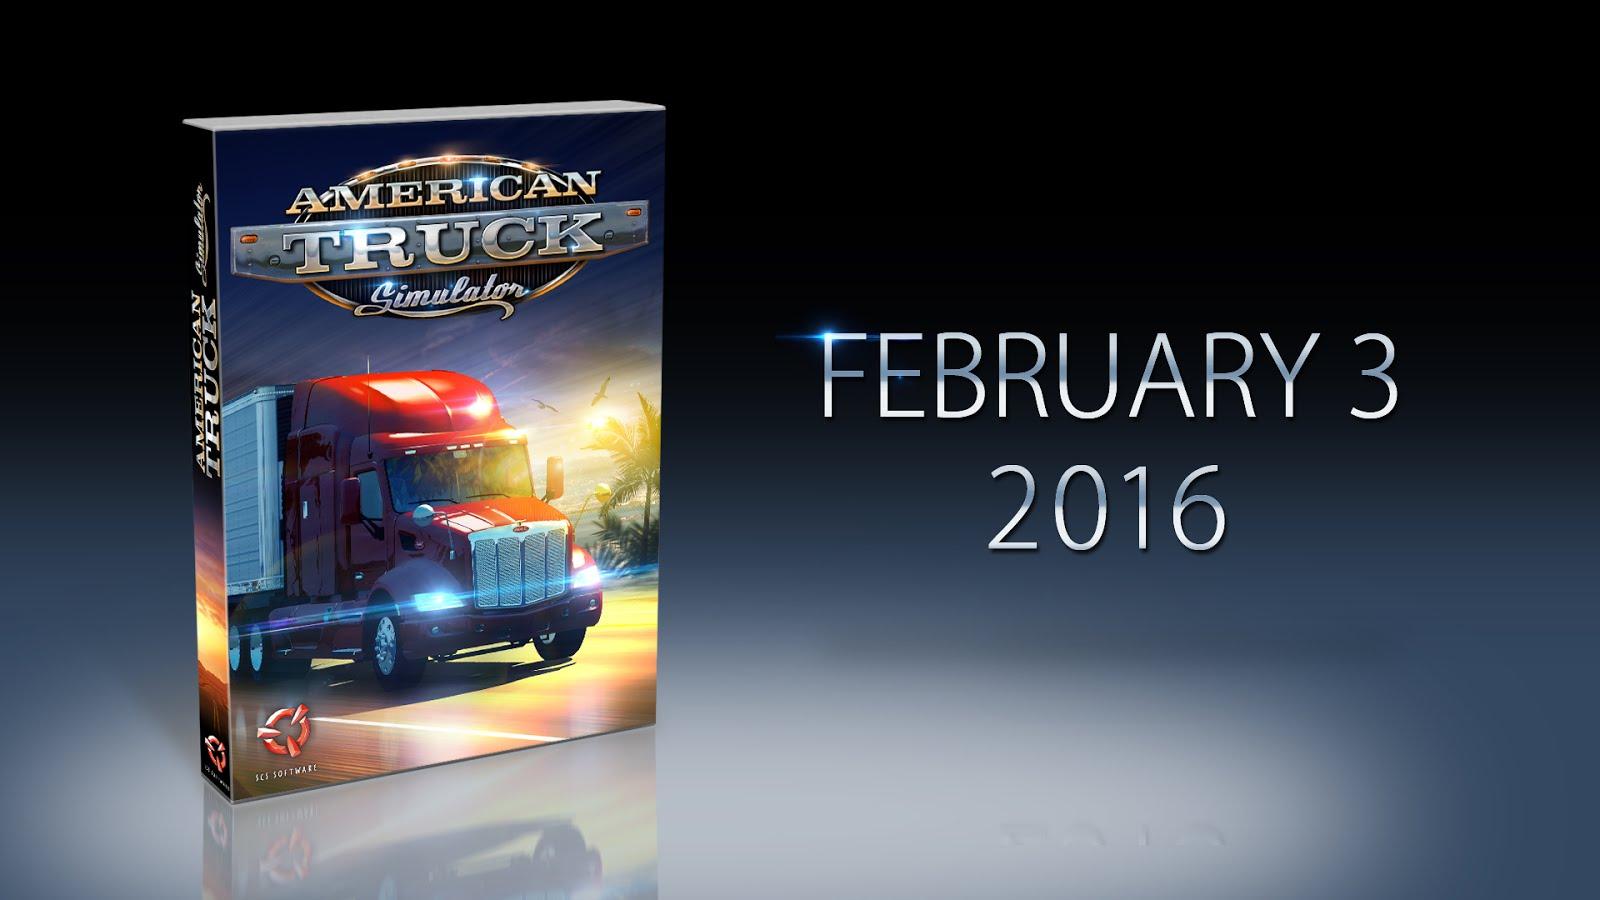 scs software 39 s blog american truck simulator release date. Black Bedroom Furniture Sets. Home Design Ideas